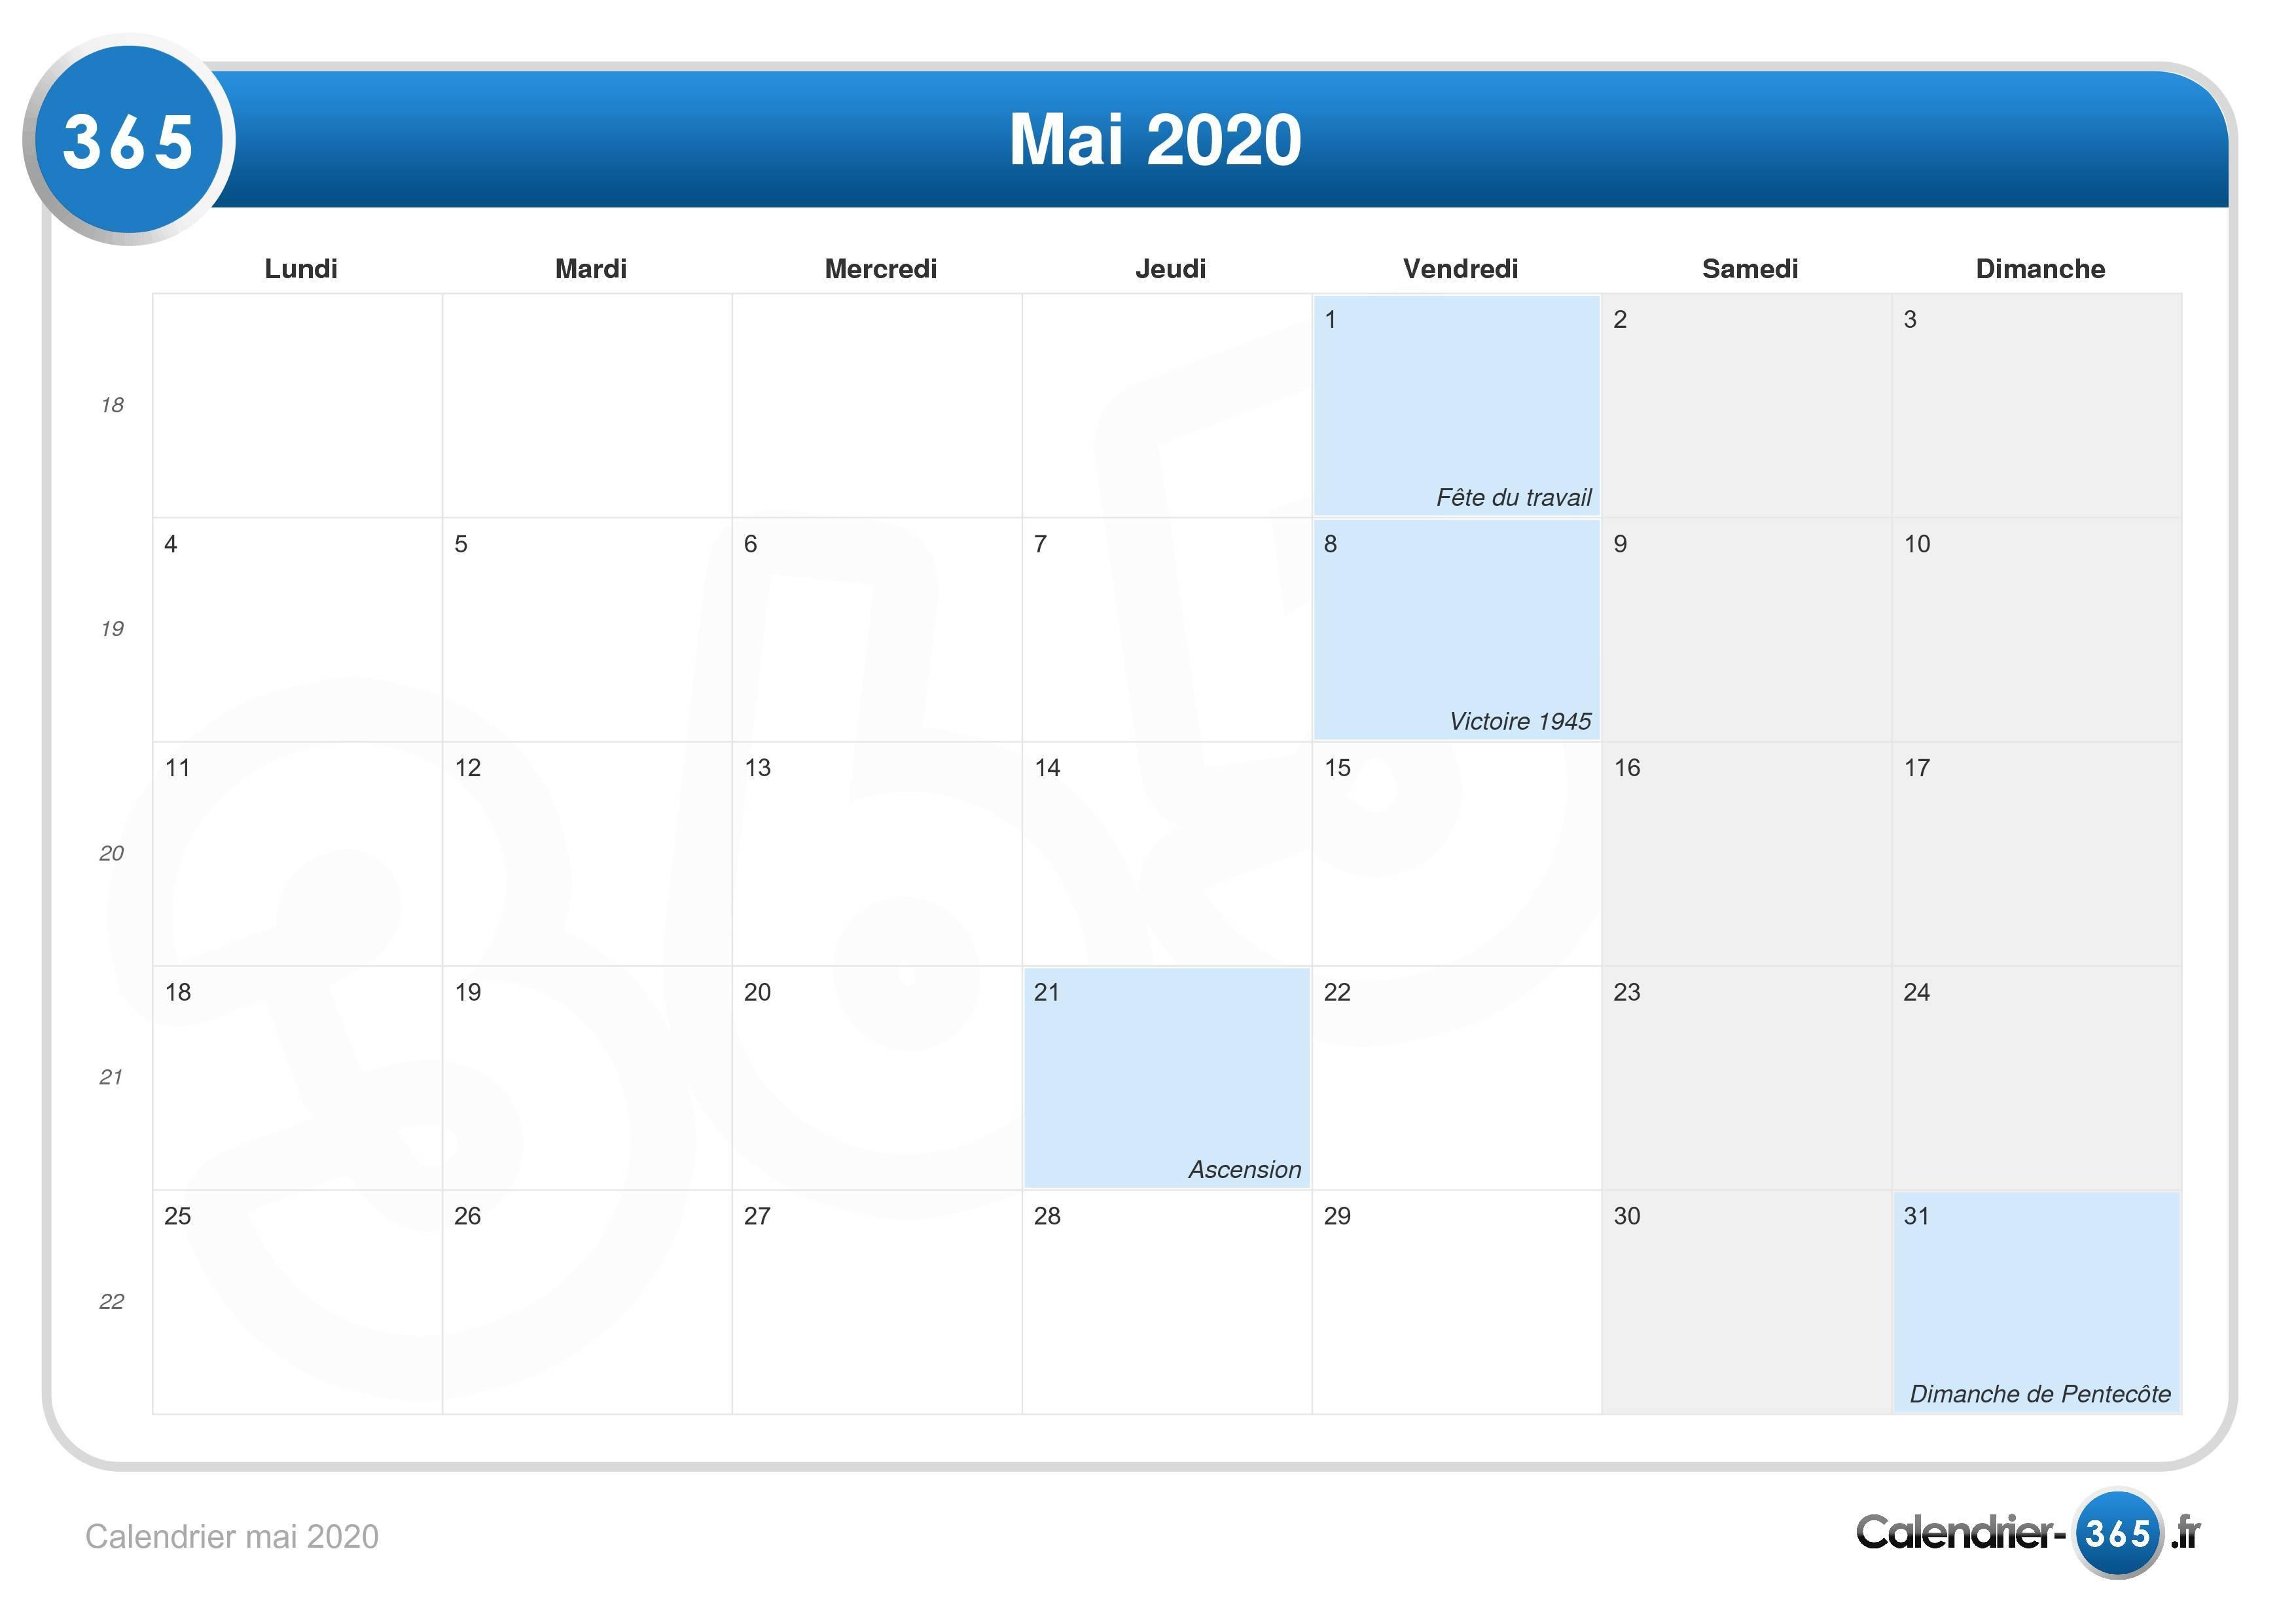 Calendrier Lunaire Mai 2020.Calendrier Mai 2020